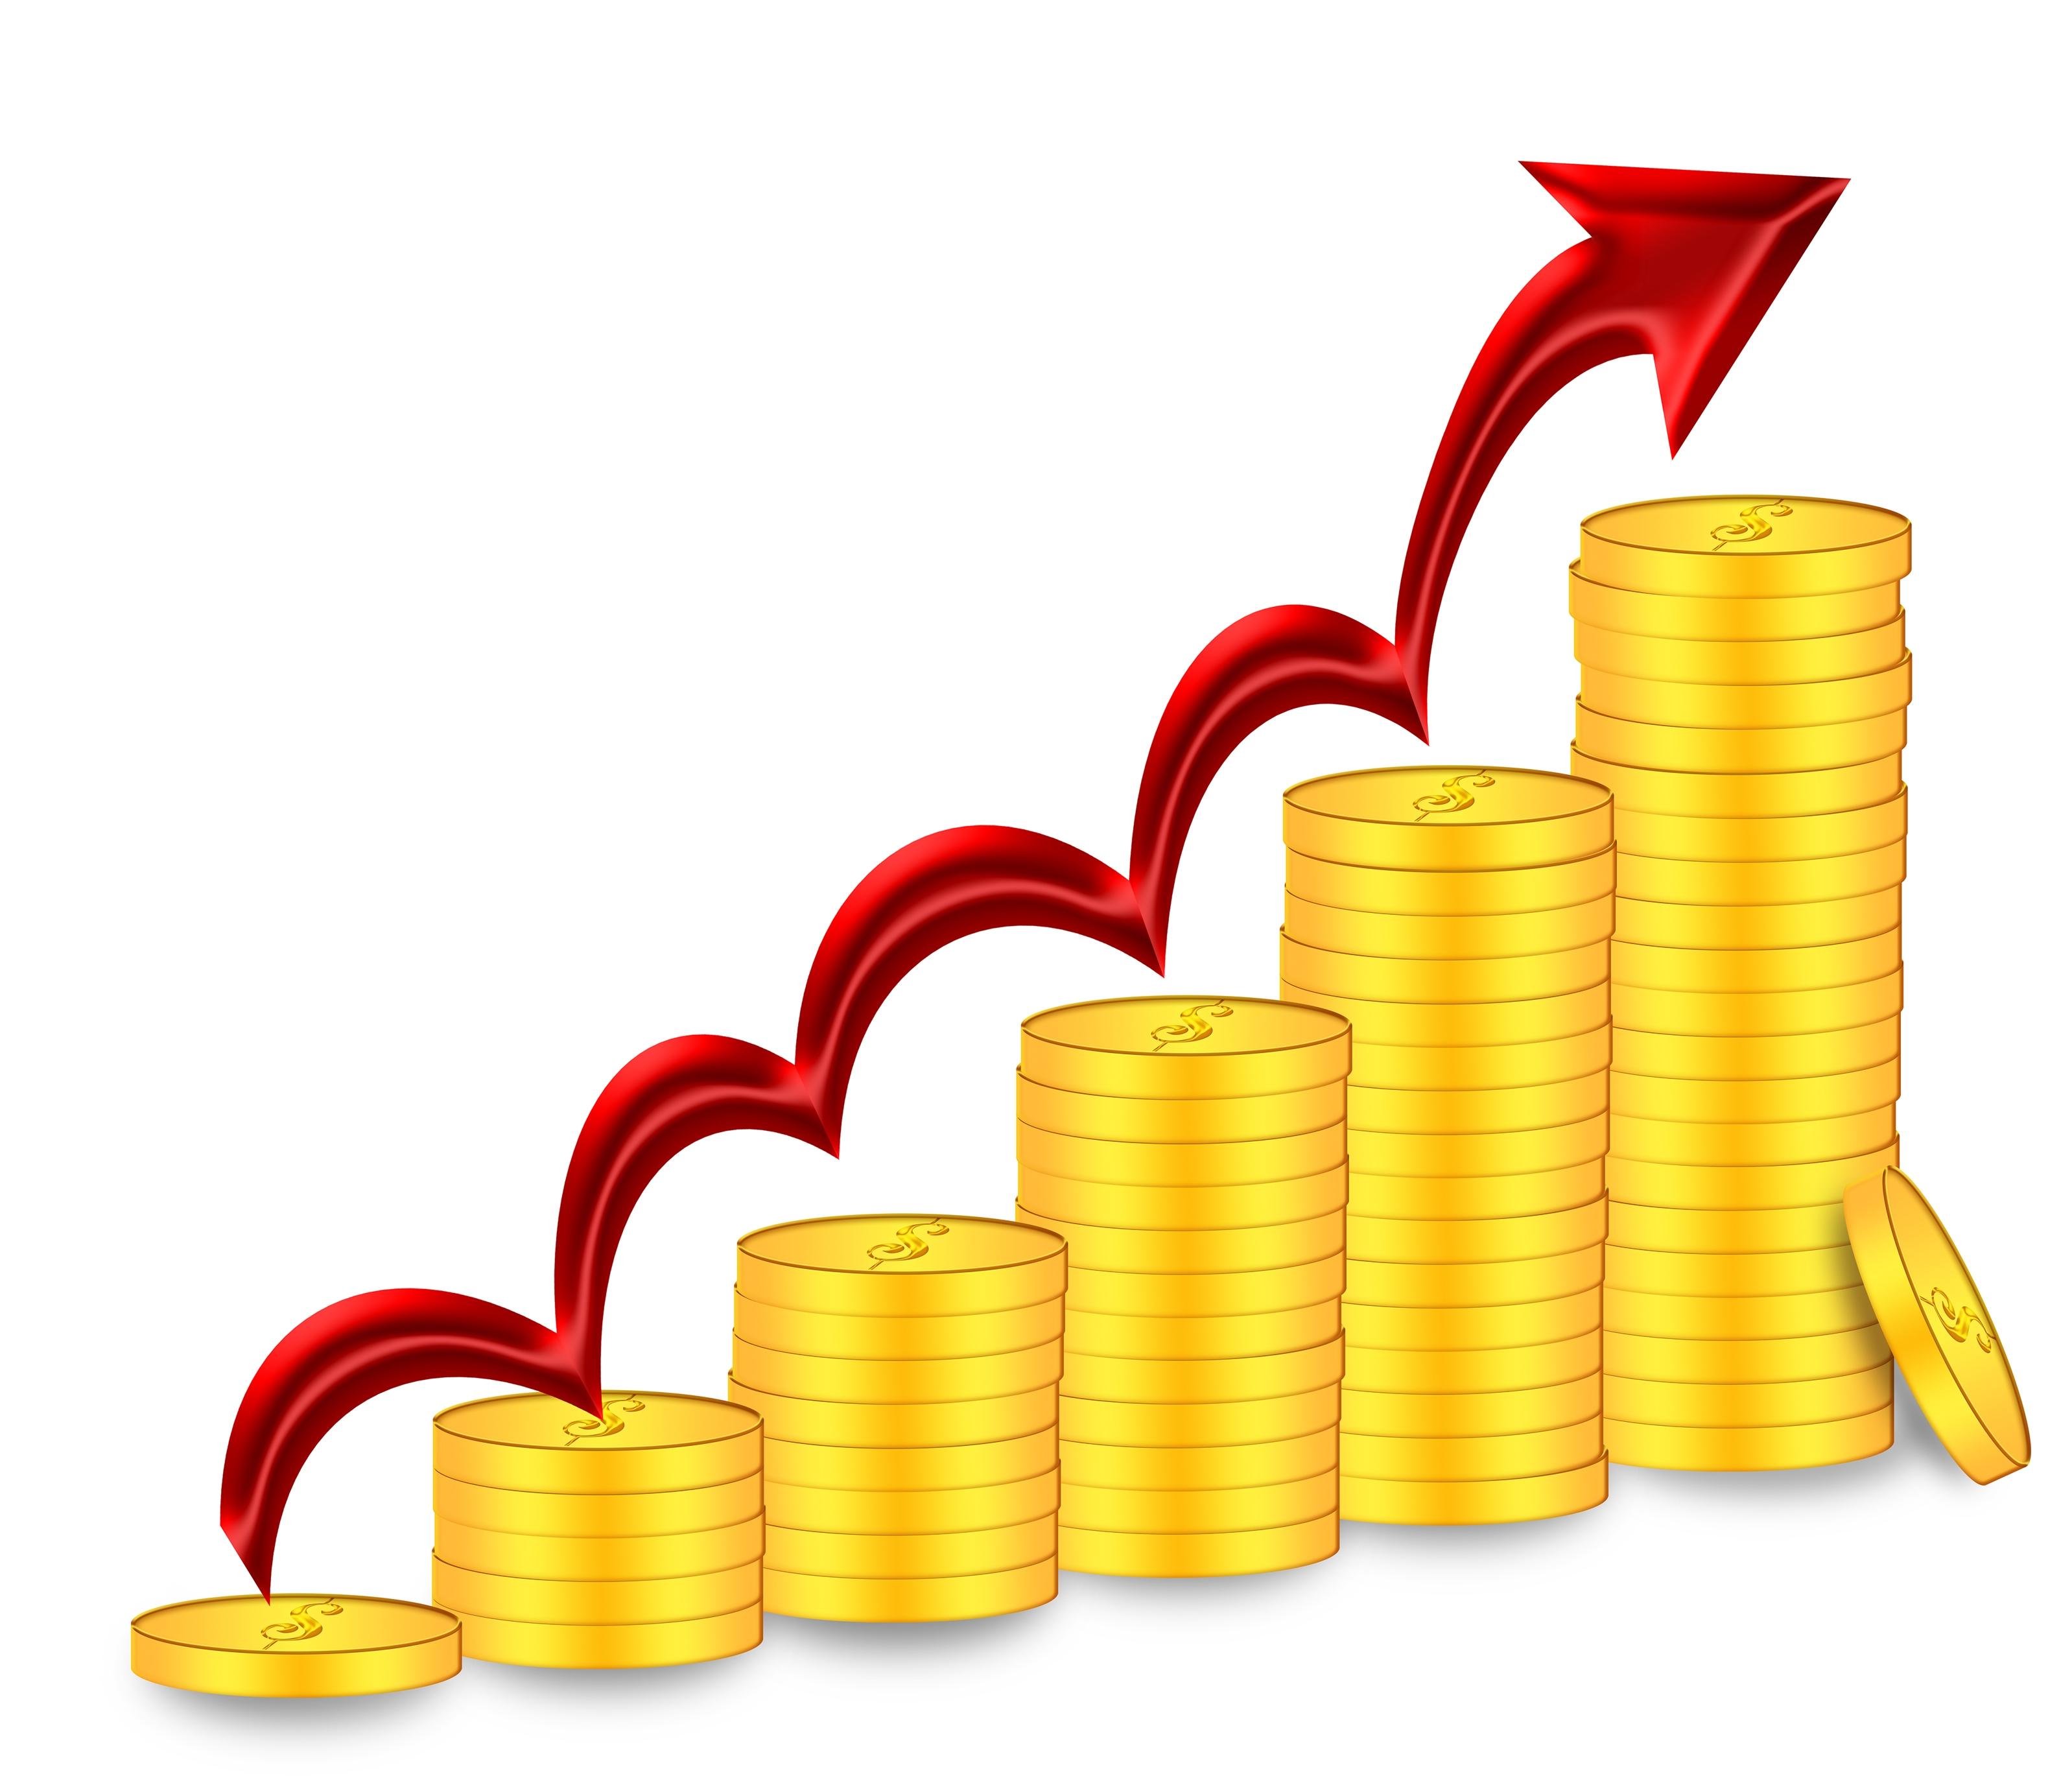 Median home price up $15,000 in Orange over last 12 months ...